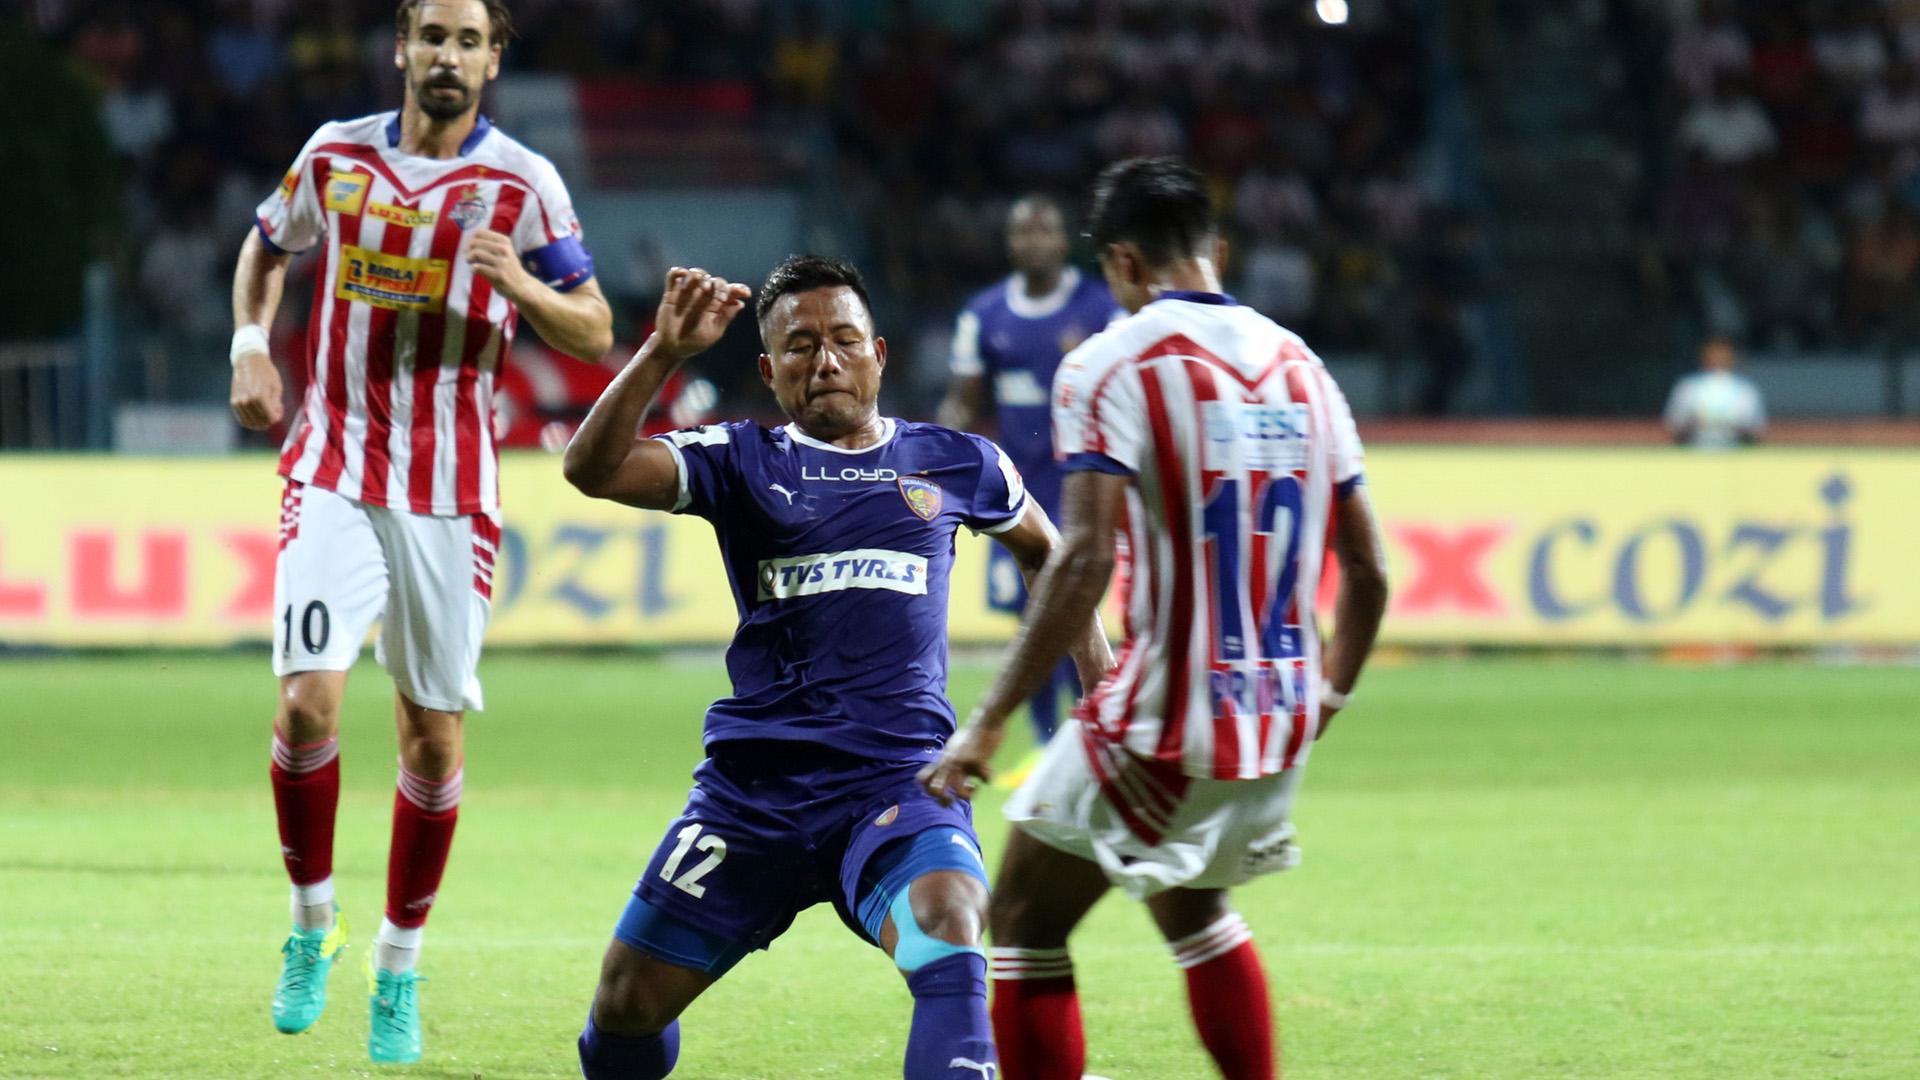 Jeje Lalphekhlua Atletico de Kolkata Chennaiyin FC ISL Season 3 2016